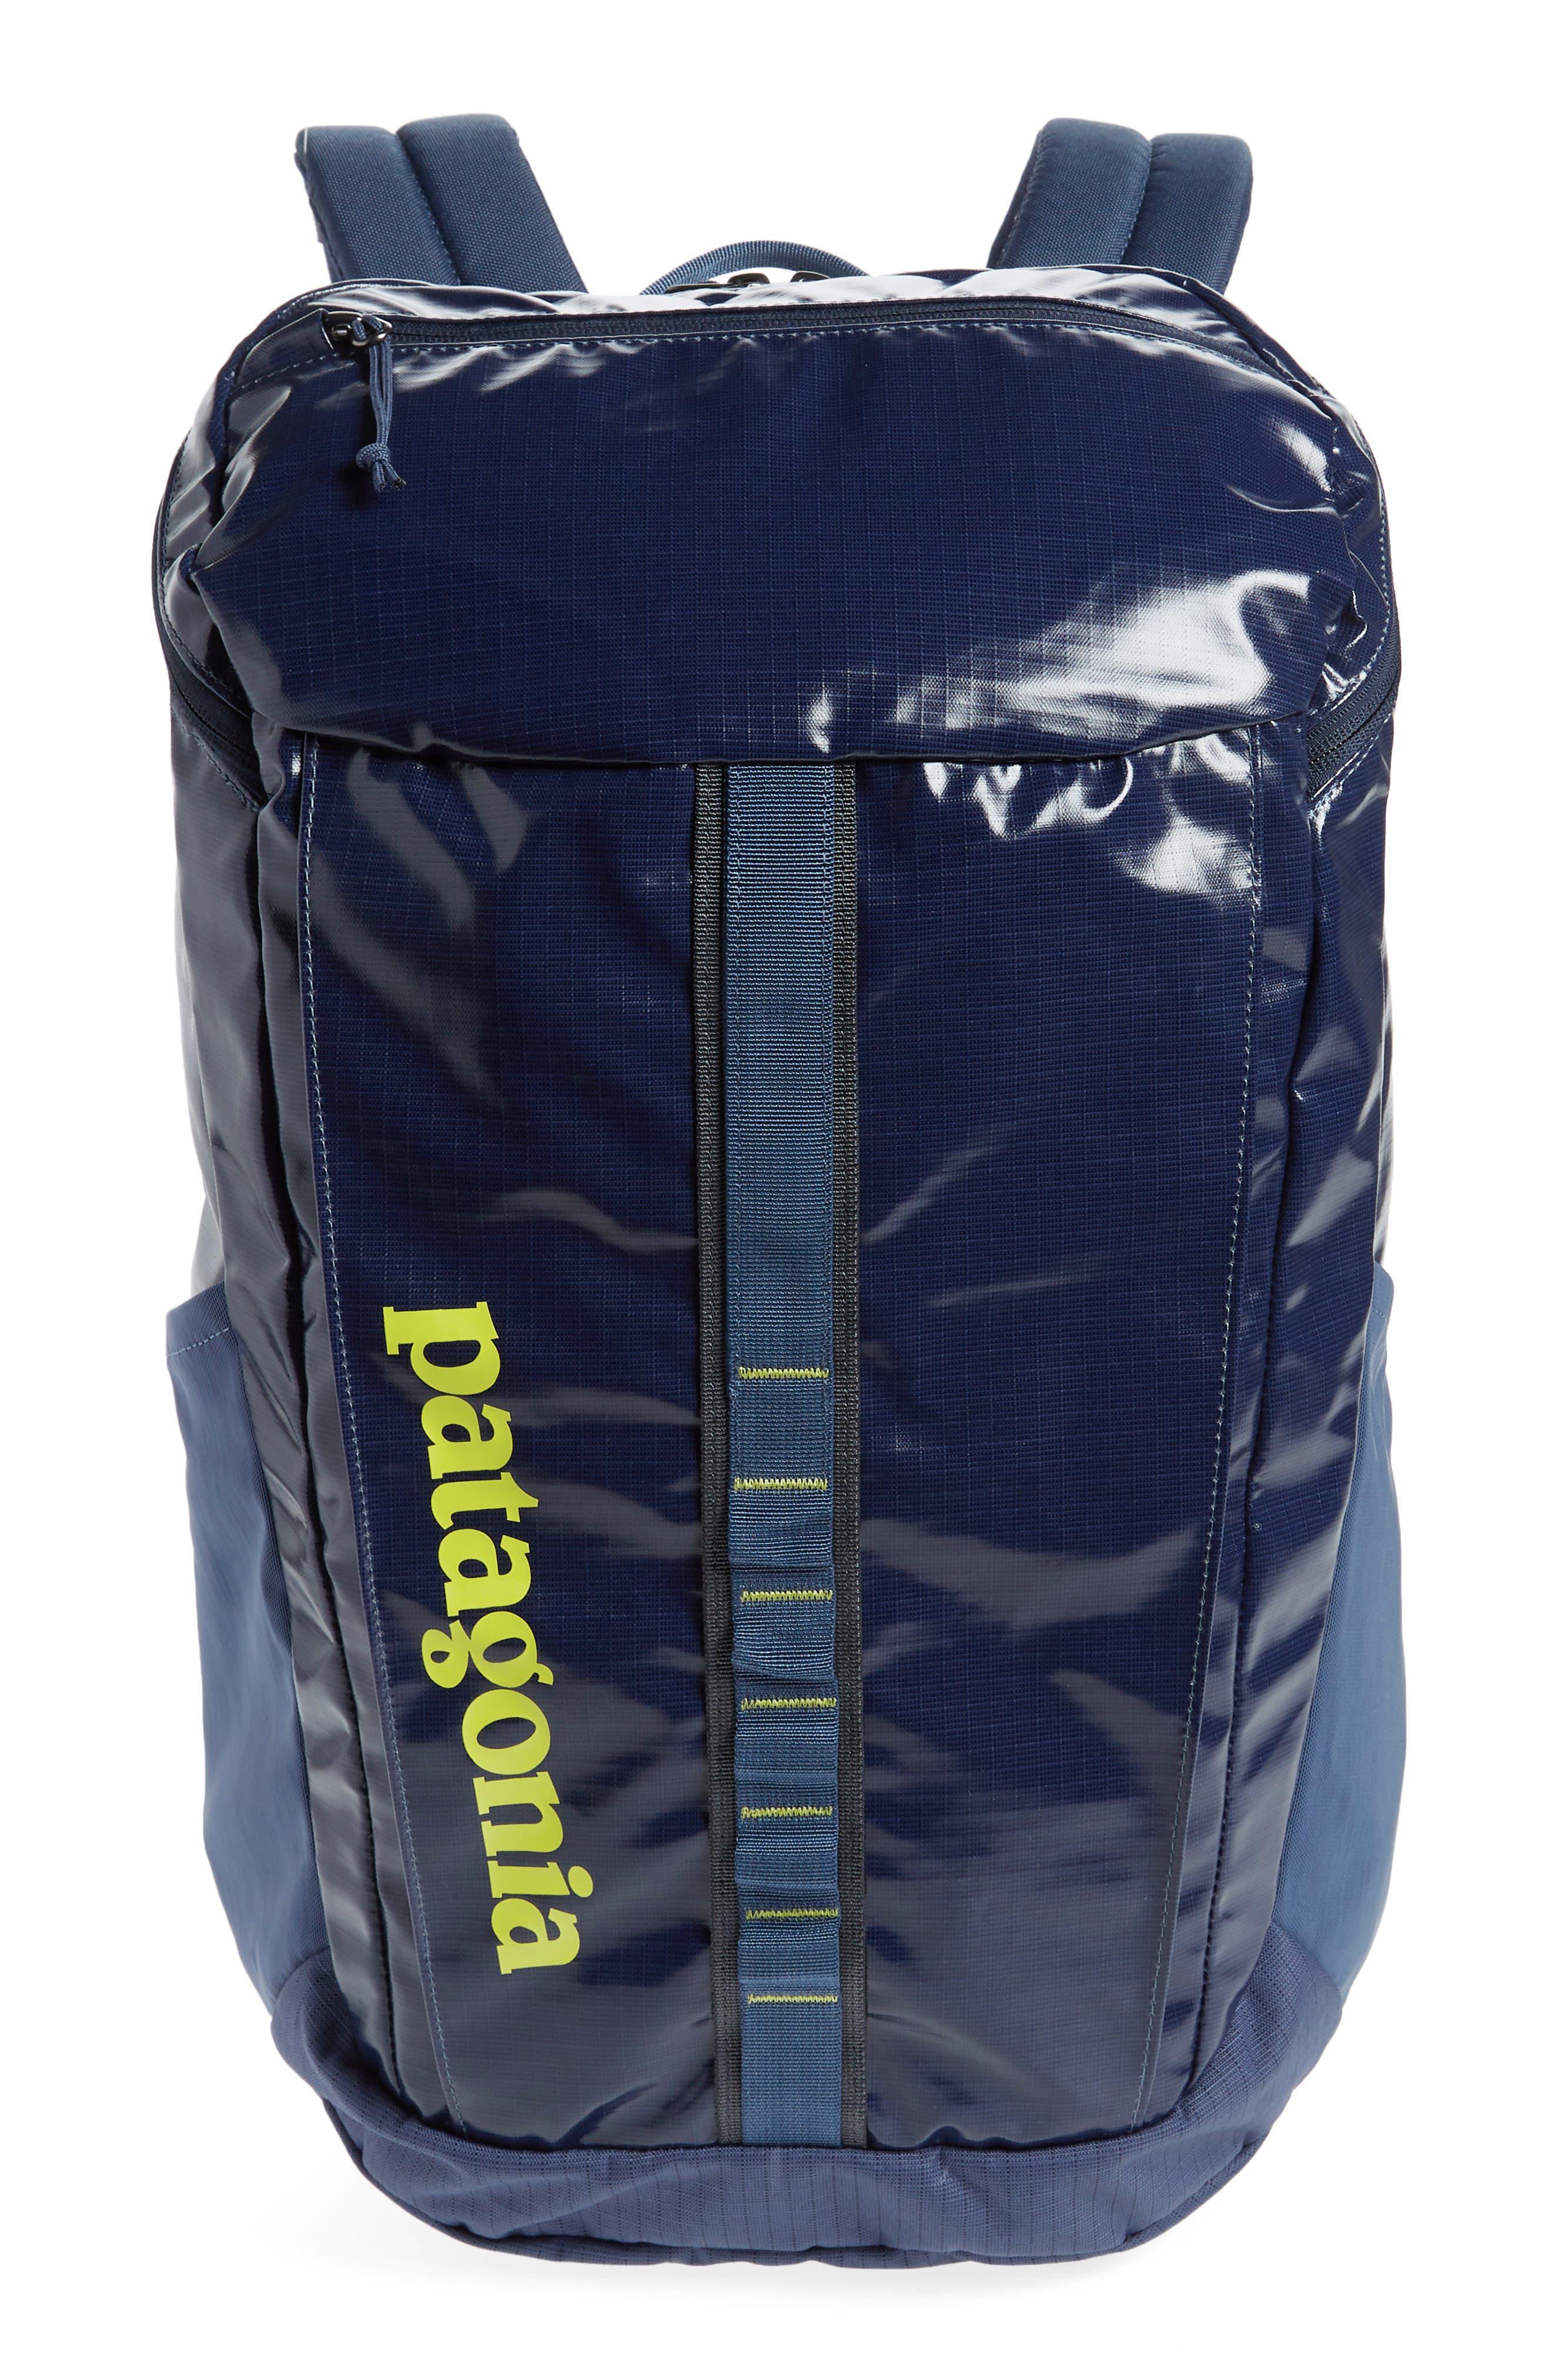 PATAGONIA, Black Hole 25 Liter Backpack, Main thumbnail 1, color, 404